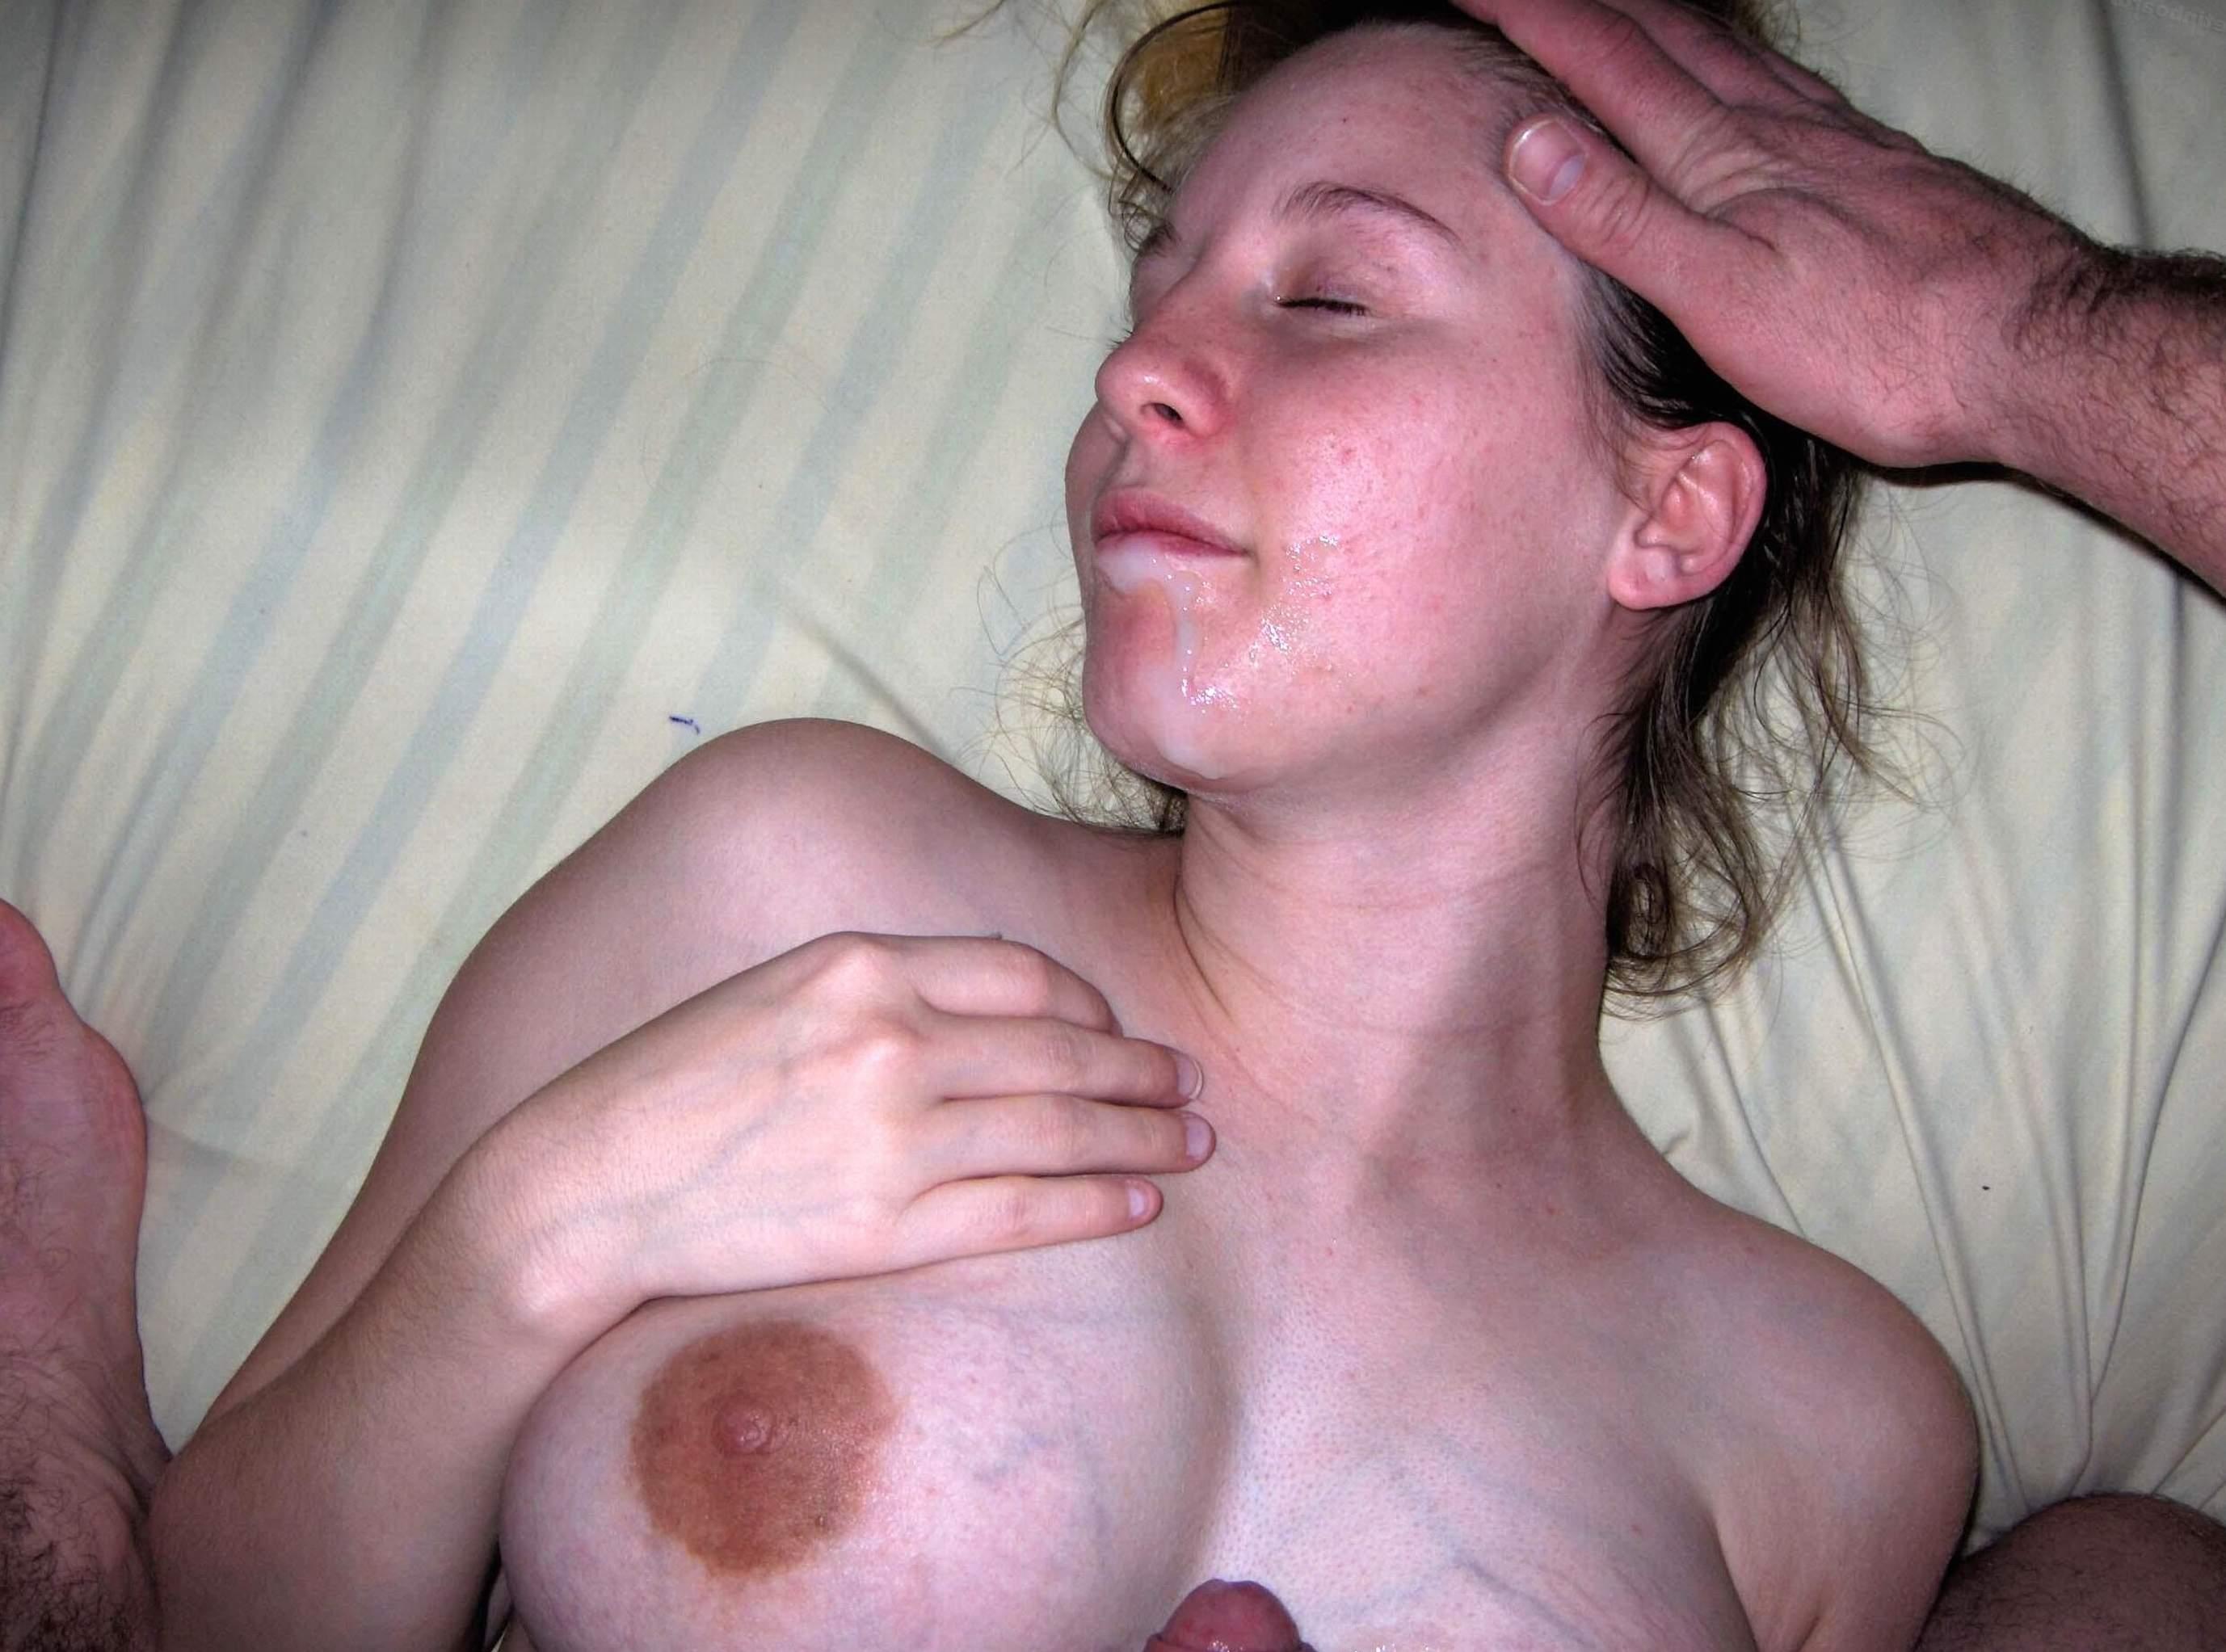 Ladygirl reccomend Sex vaginal cumshots